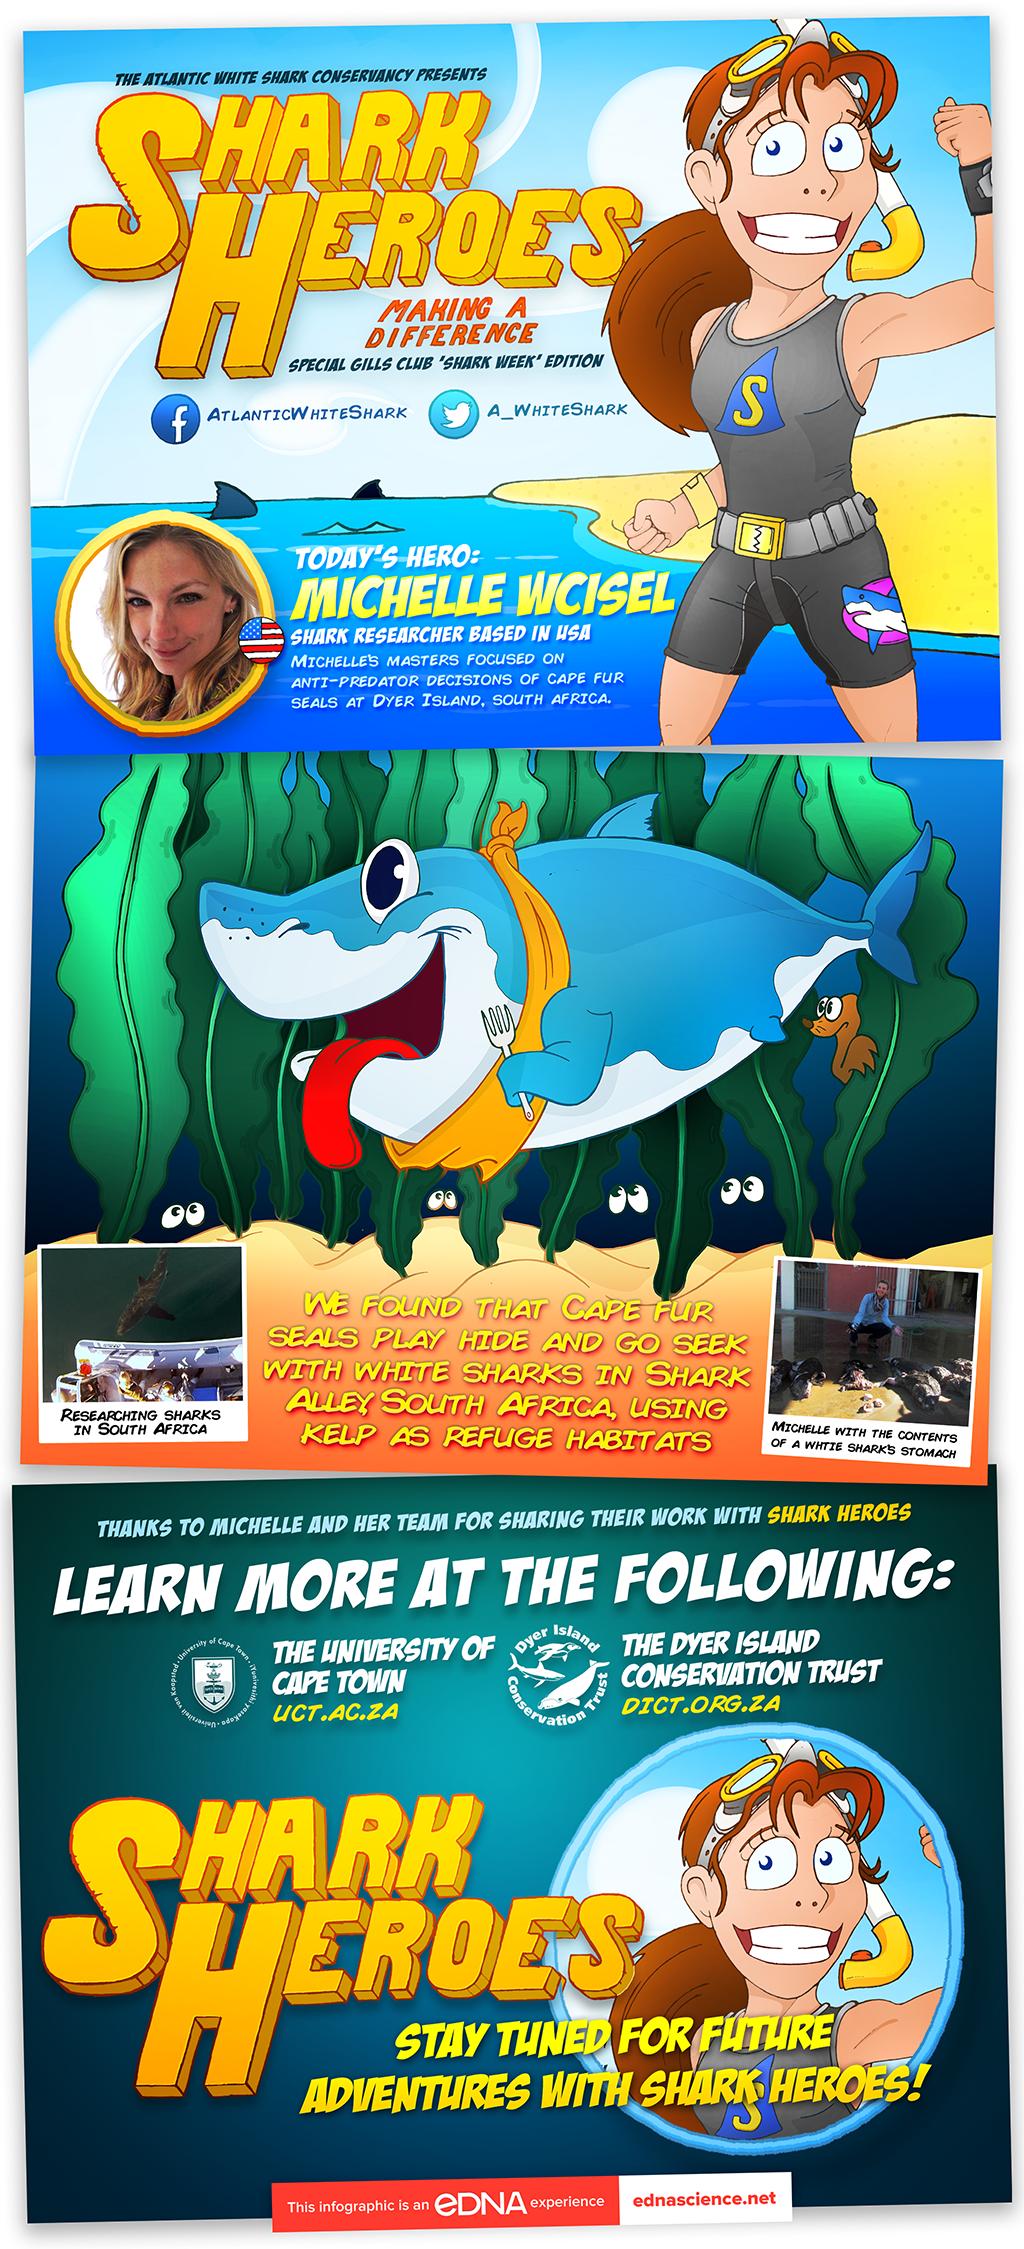 Michelle Wcisel - Shark Hero!